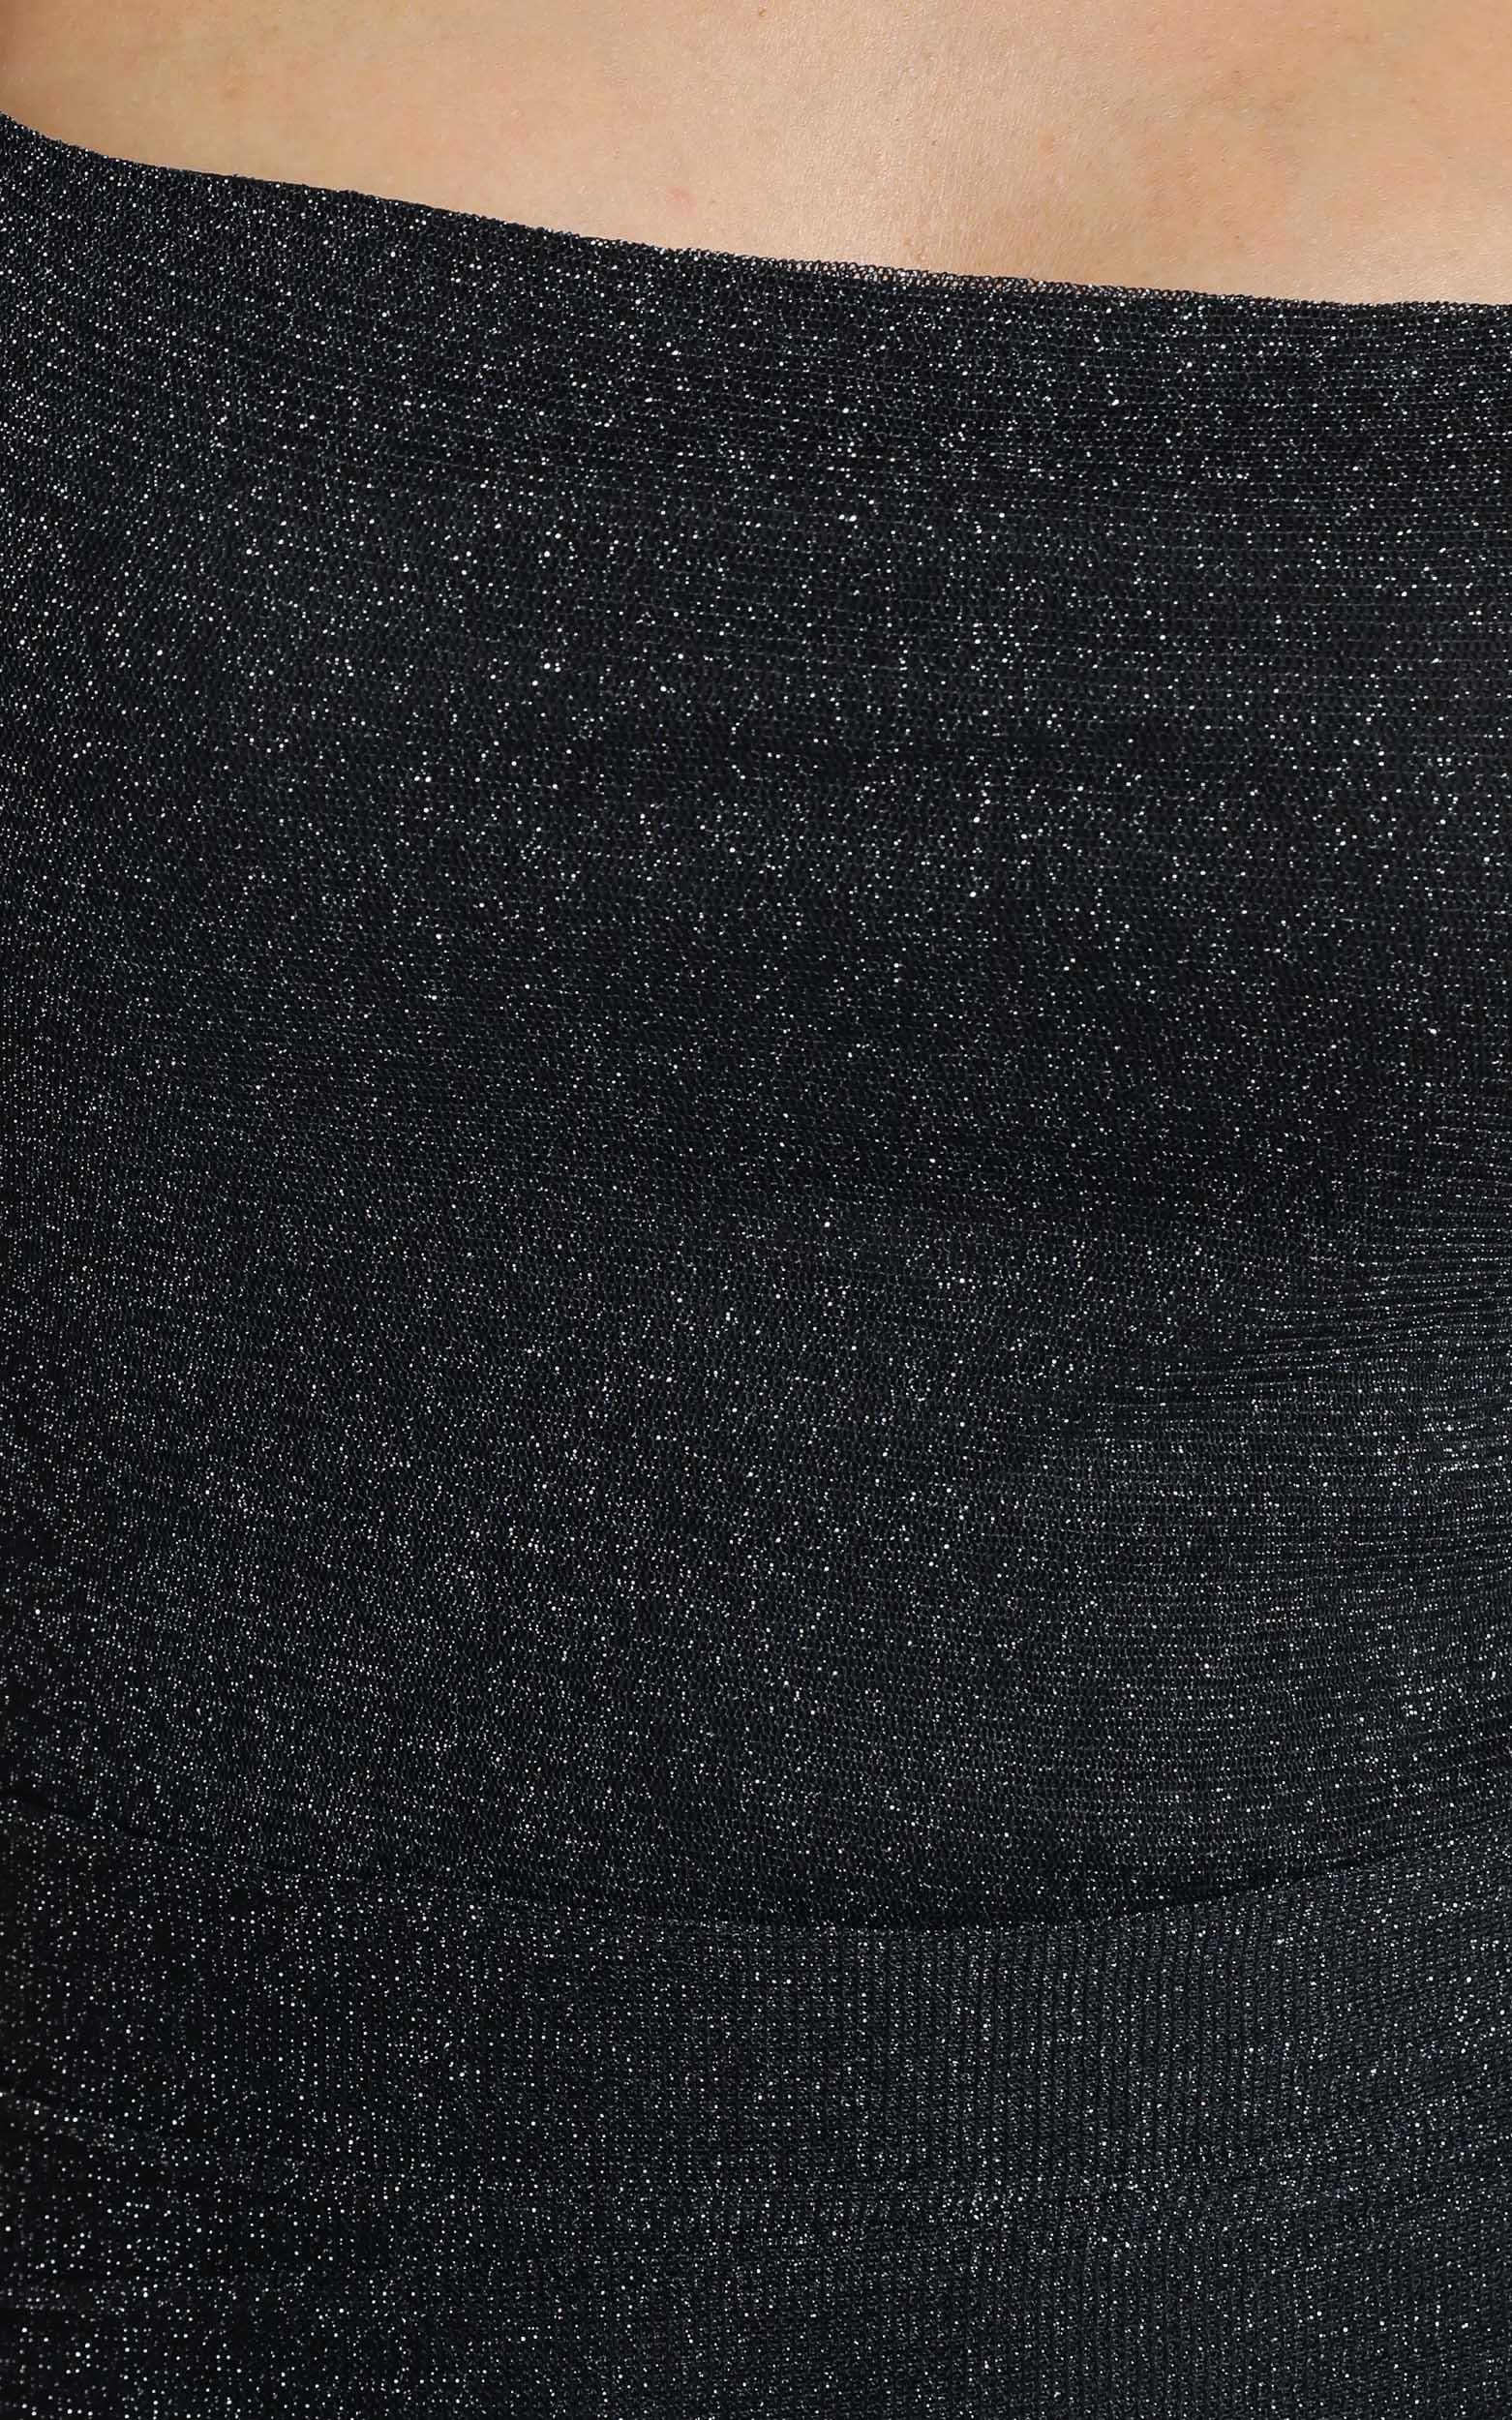 Time stands still dress in black mesh lurex - 20 (XXXXL), Black, hi-res image number null